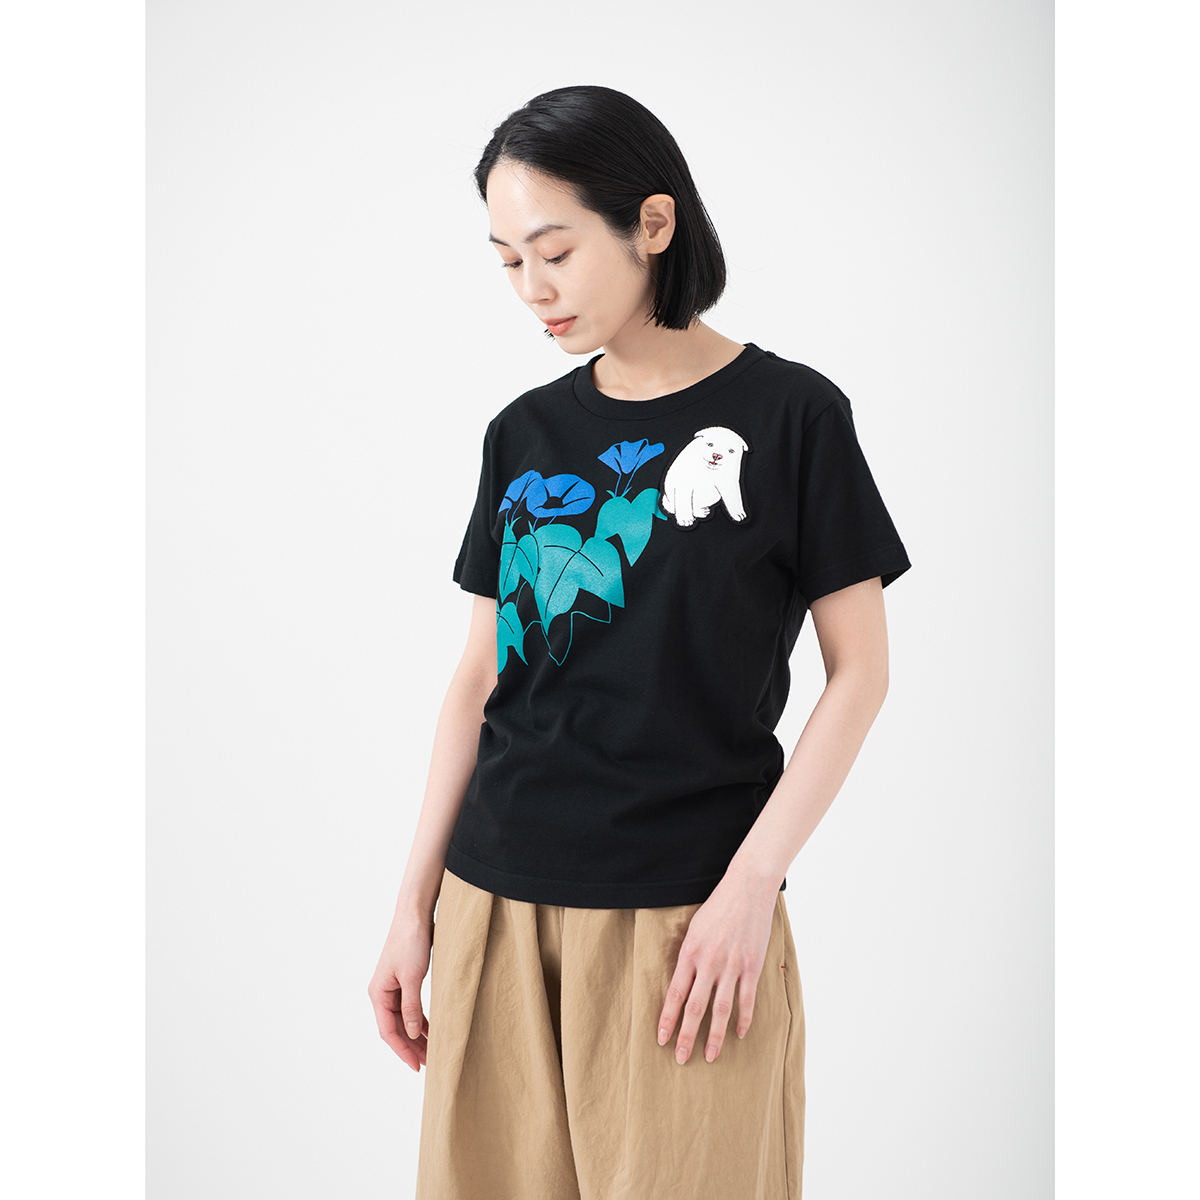 KY54-848/Tシャツ(黒)/しろ